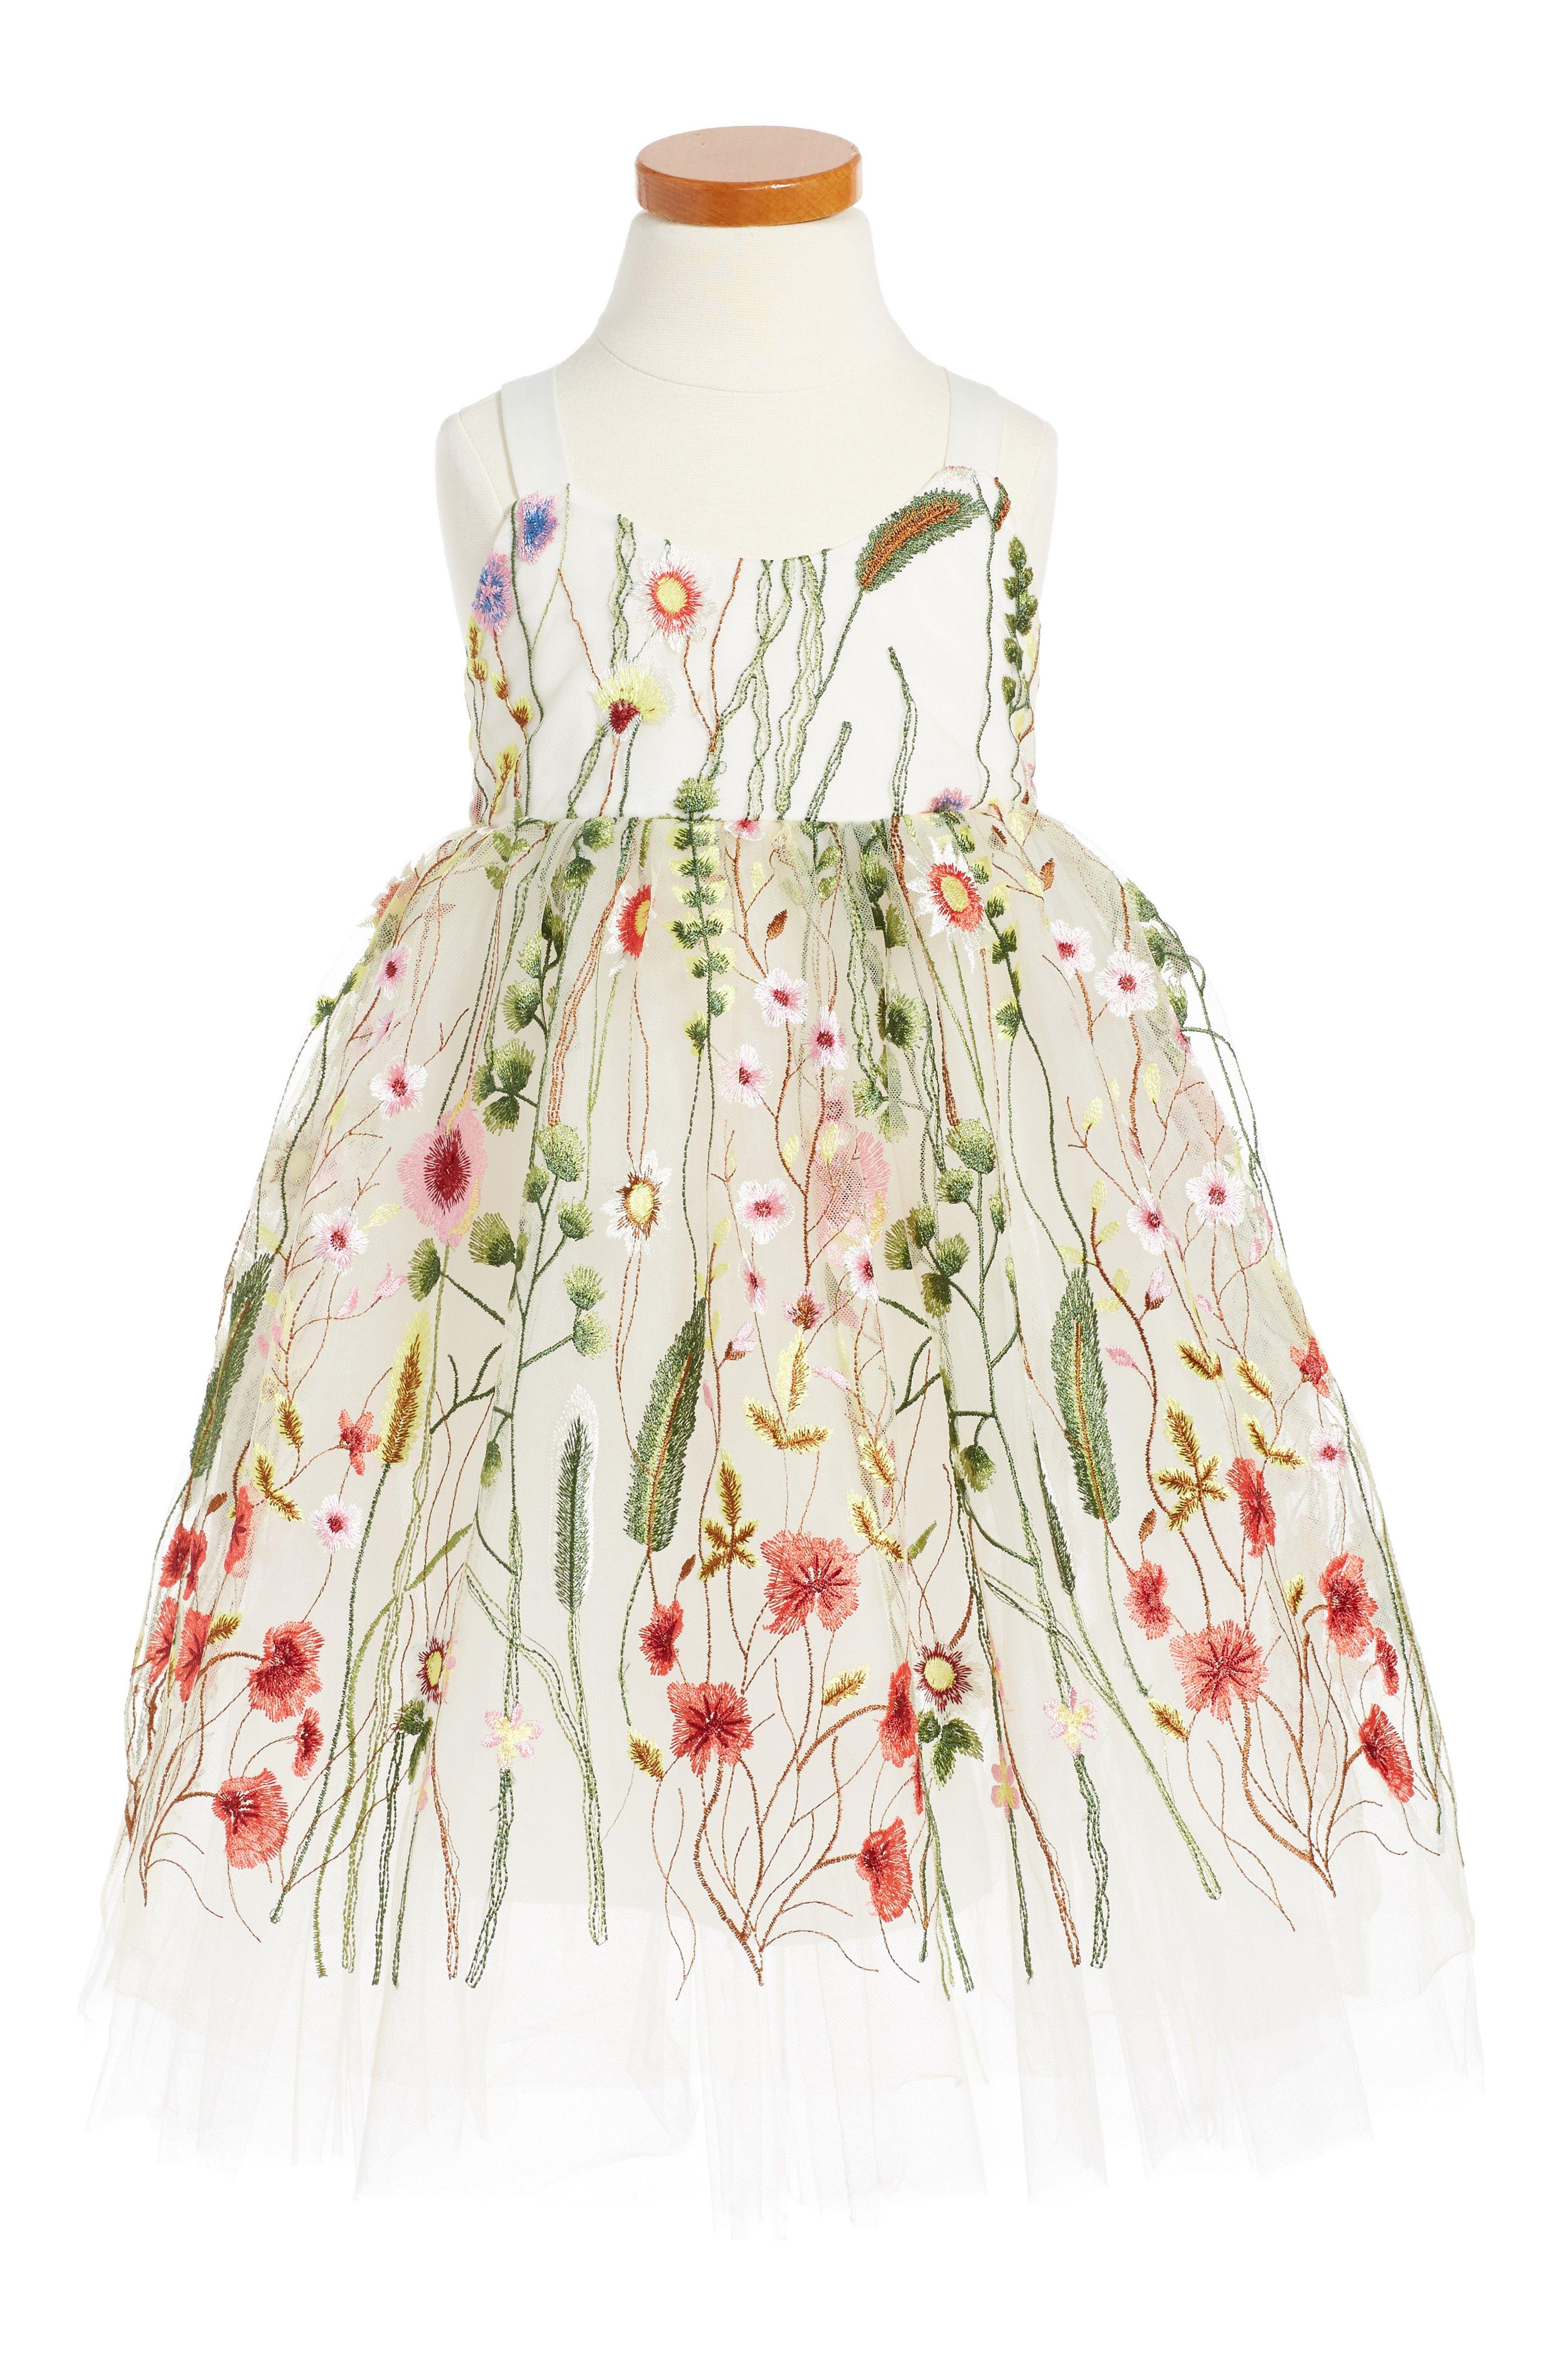 Little girl dresses for weddings  Main Image  Halabaloo Embroidered Sleeveless Dress Toddler Girls